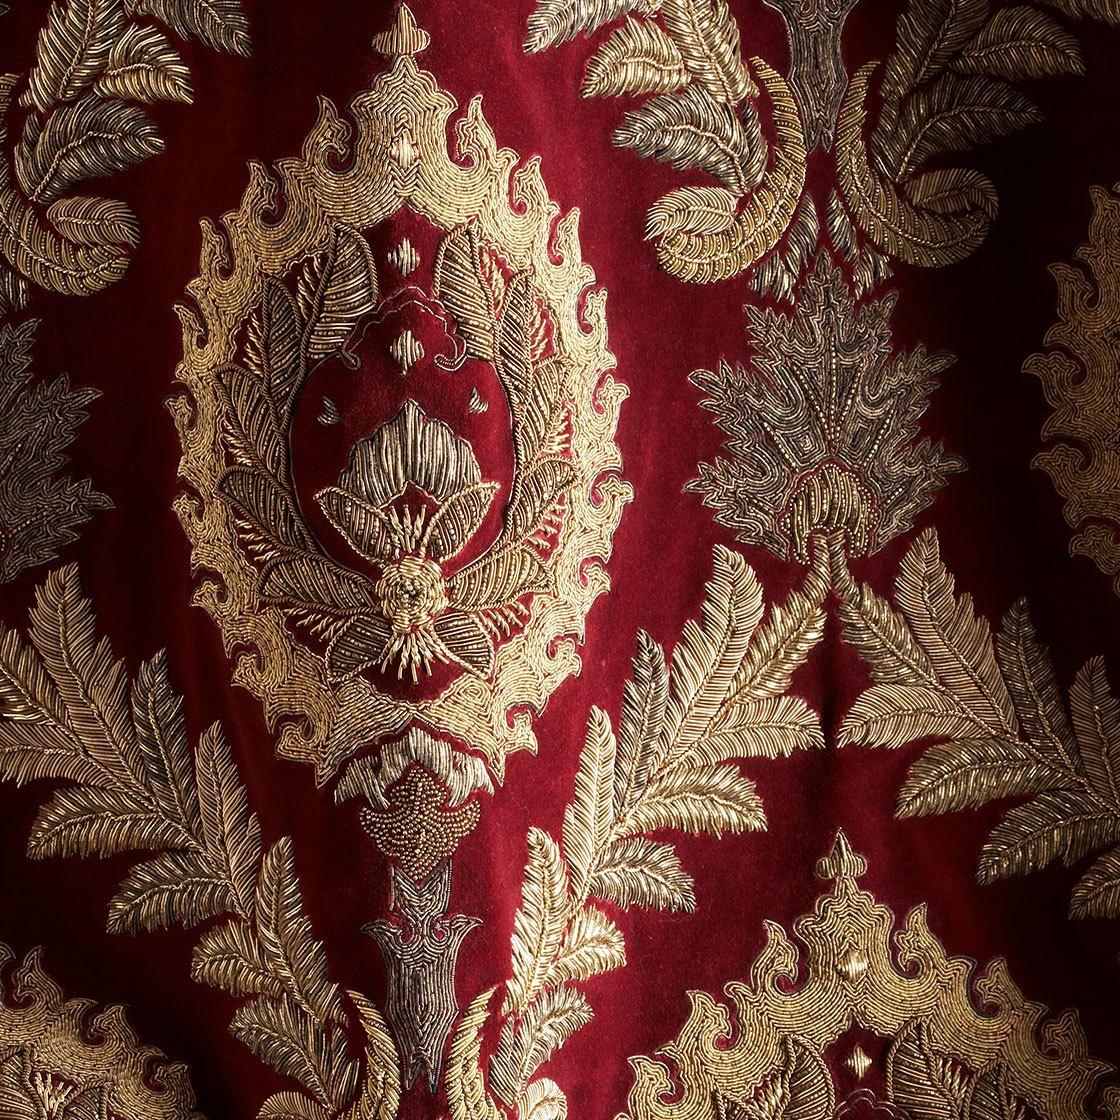 Rossini - On Capri Silk Velvet Loganberry - Beaumont & Fletcher - Beaumont & Fletcher